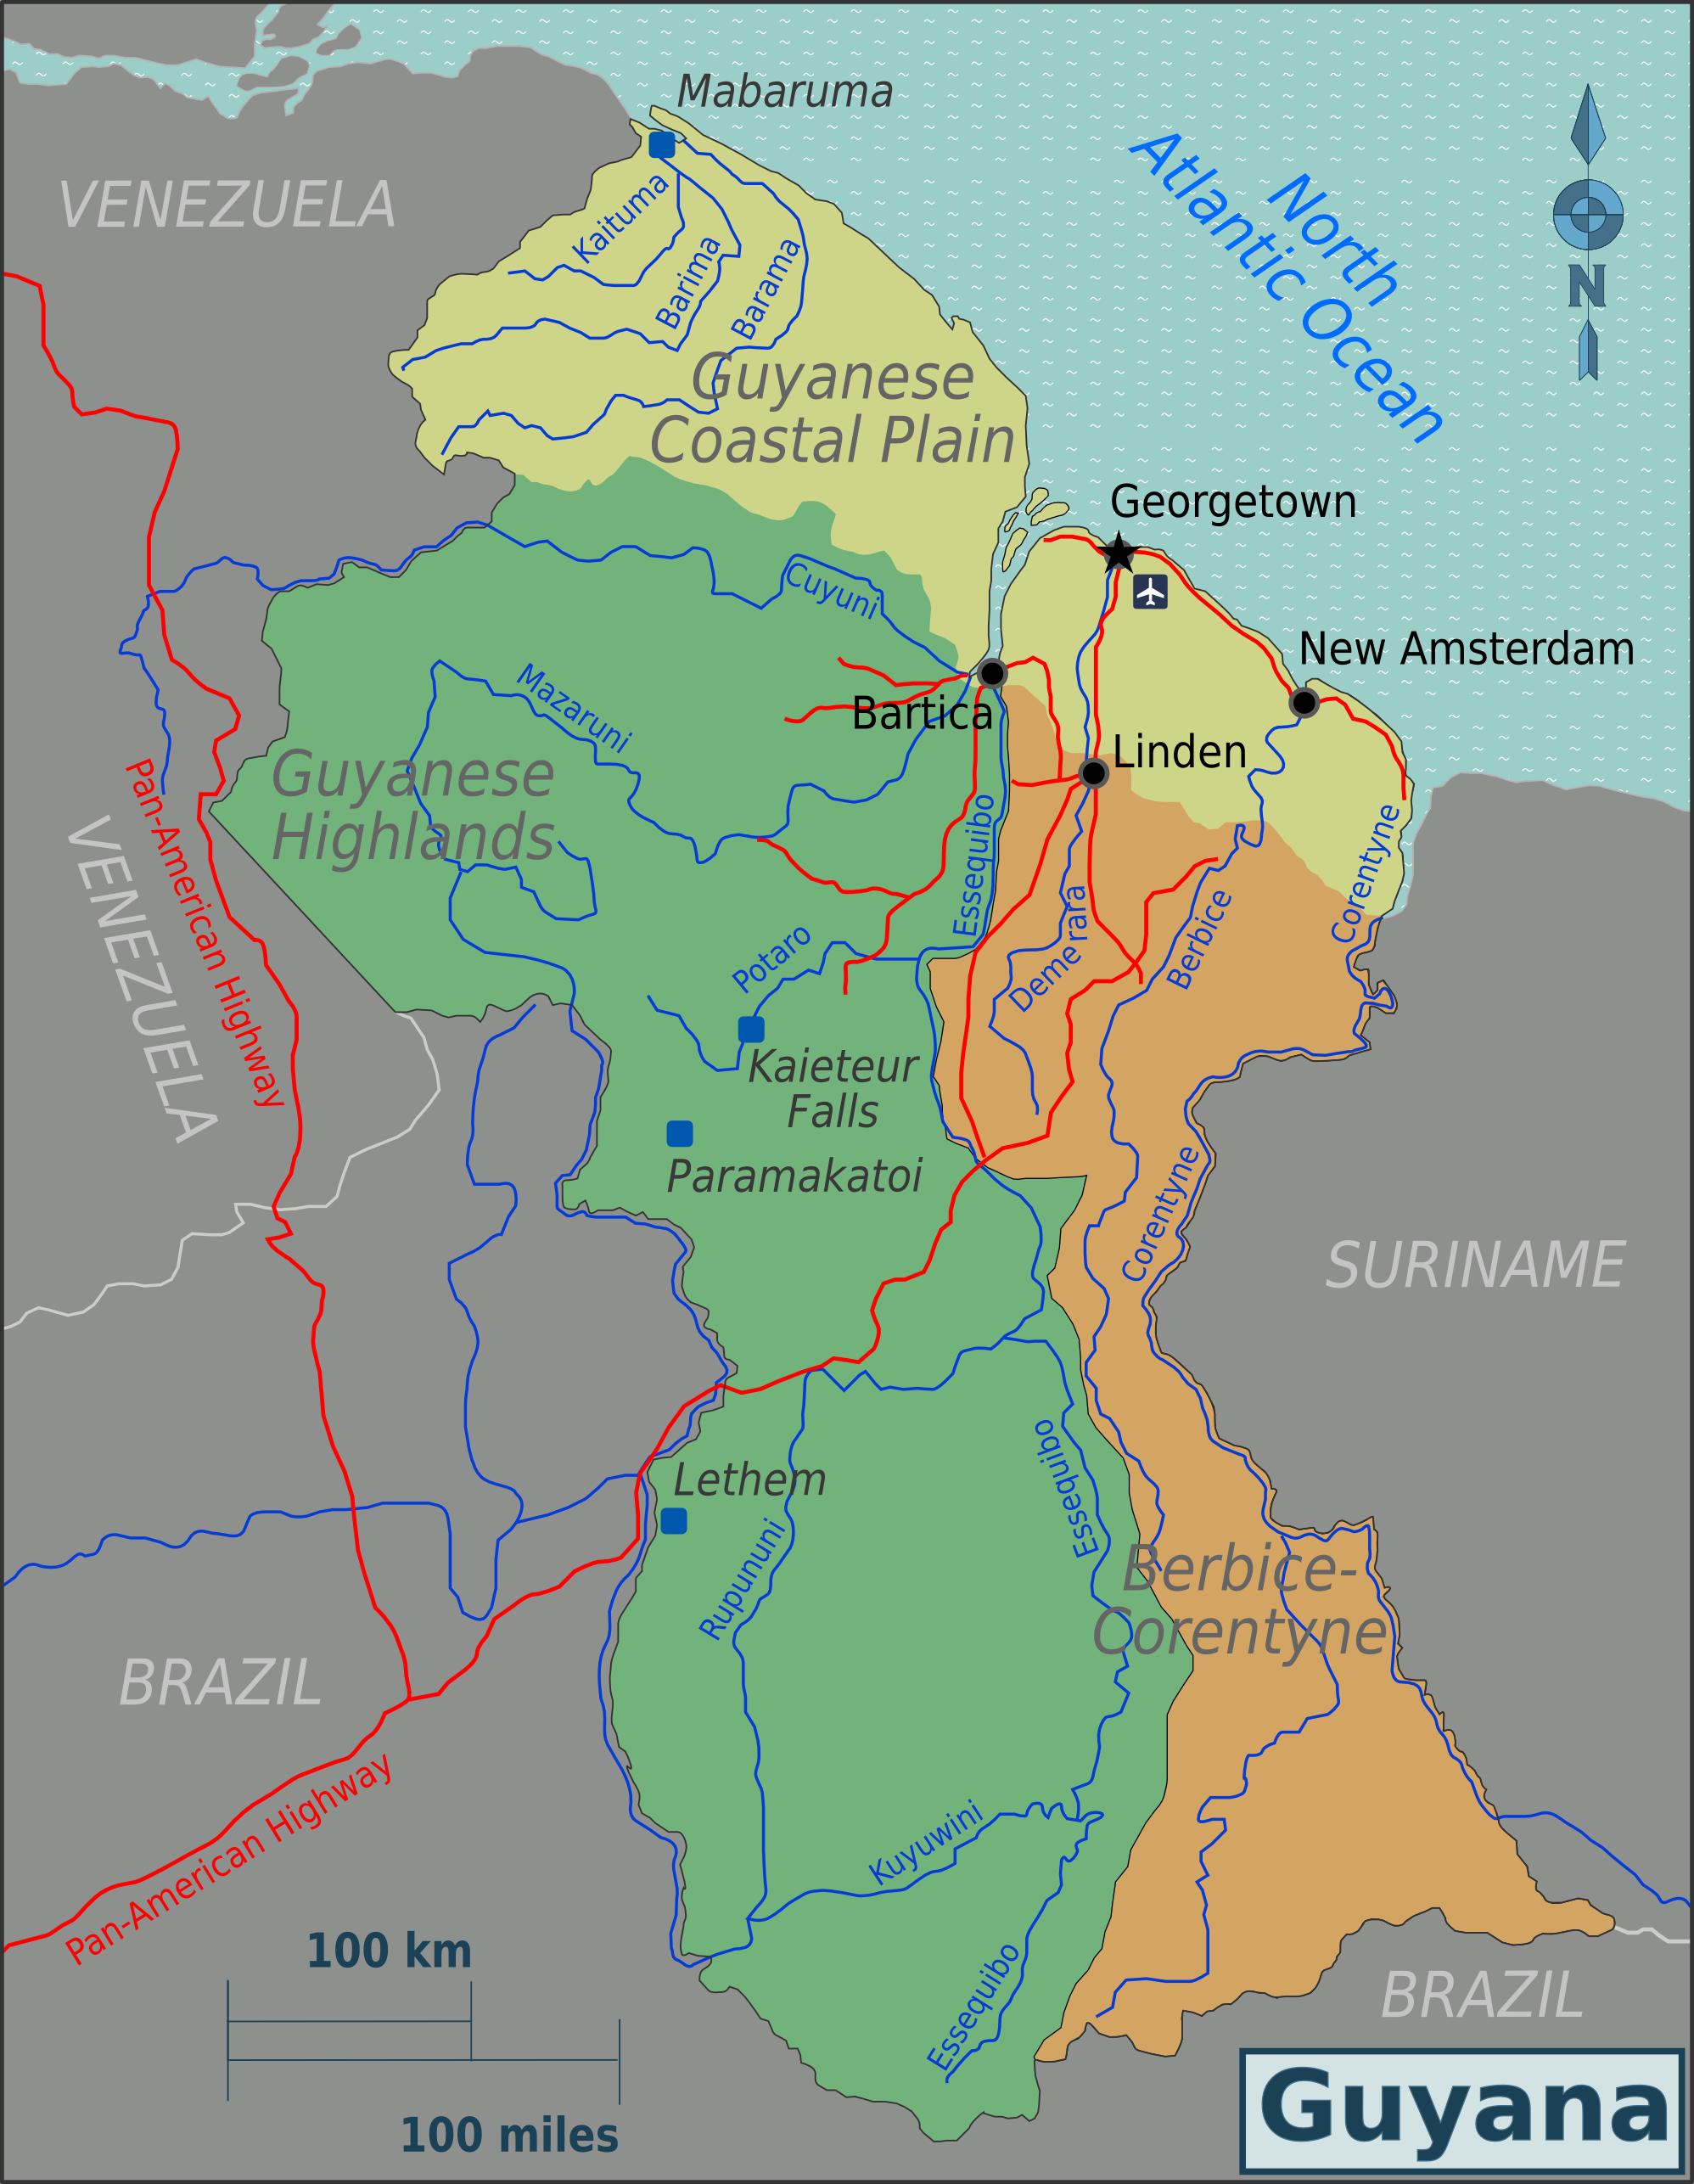 FileGuyana Regions mappng Wikimedia Commons